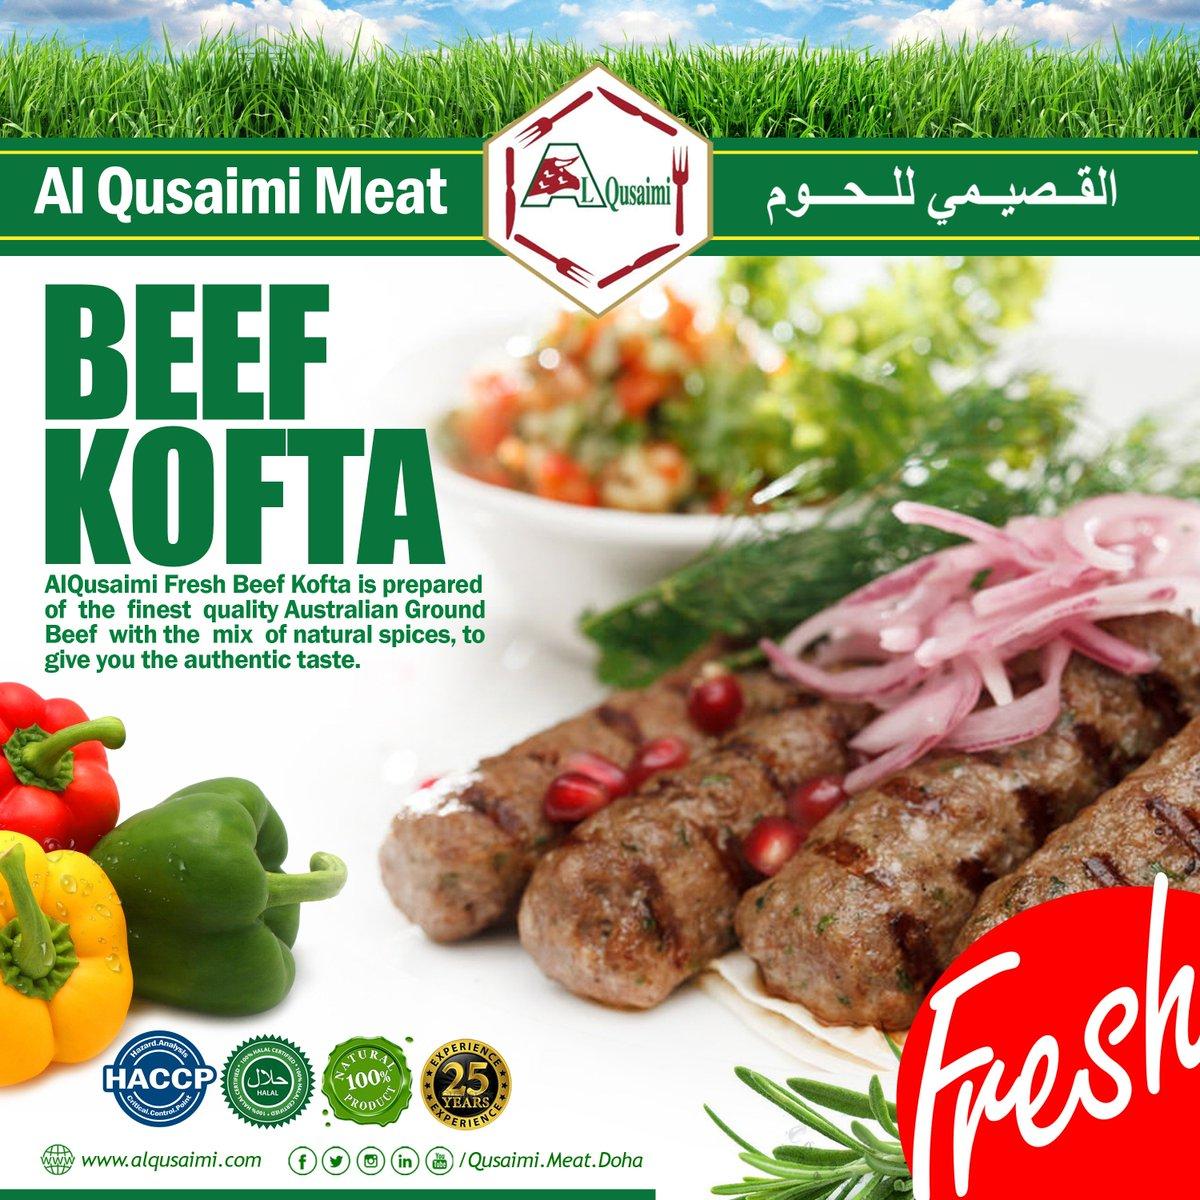 AlQusaimi Meat Co  (@AlQusaimiMeat) | Twitter